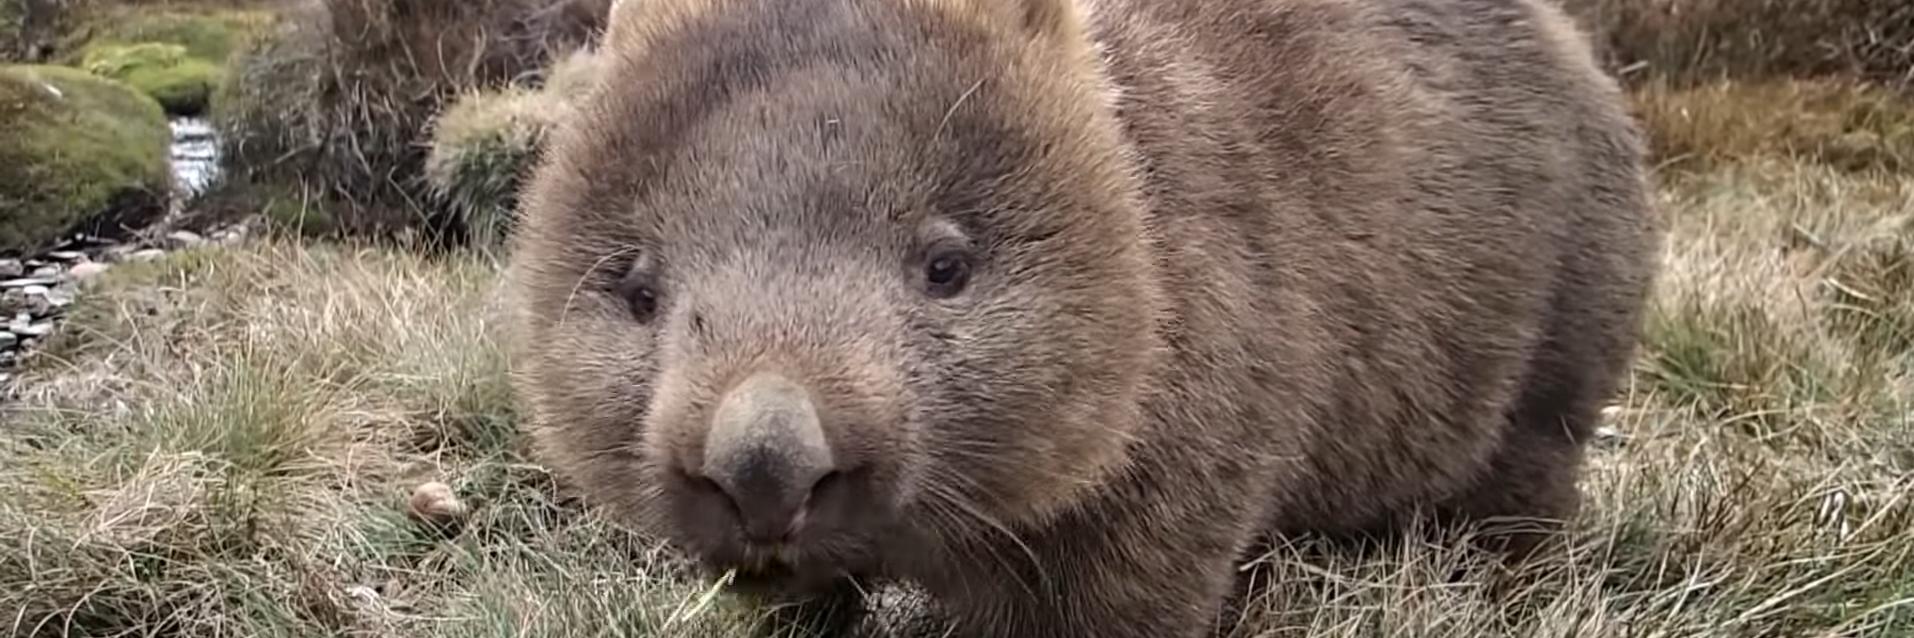 Wombat kauend